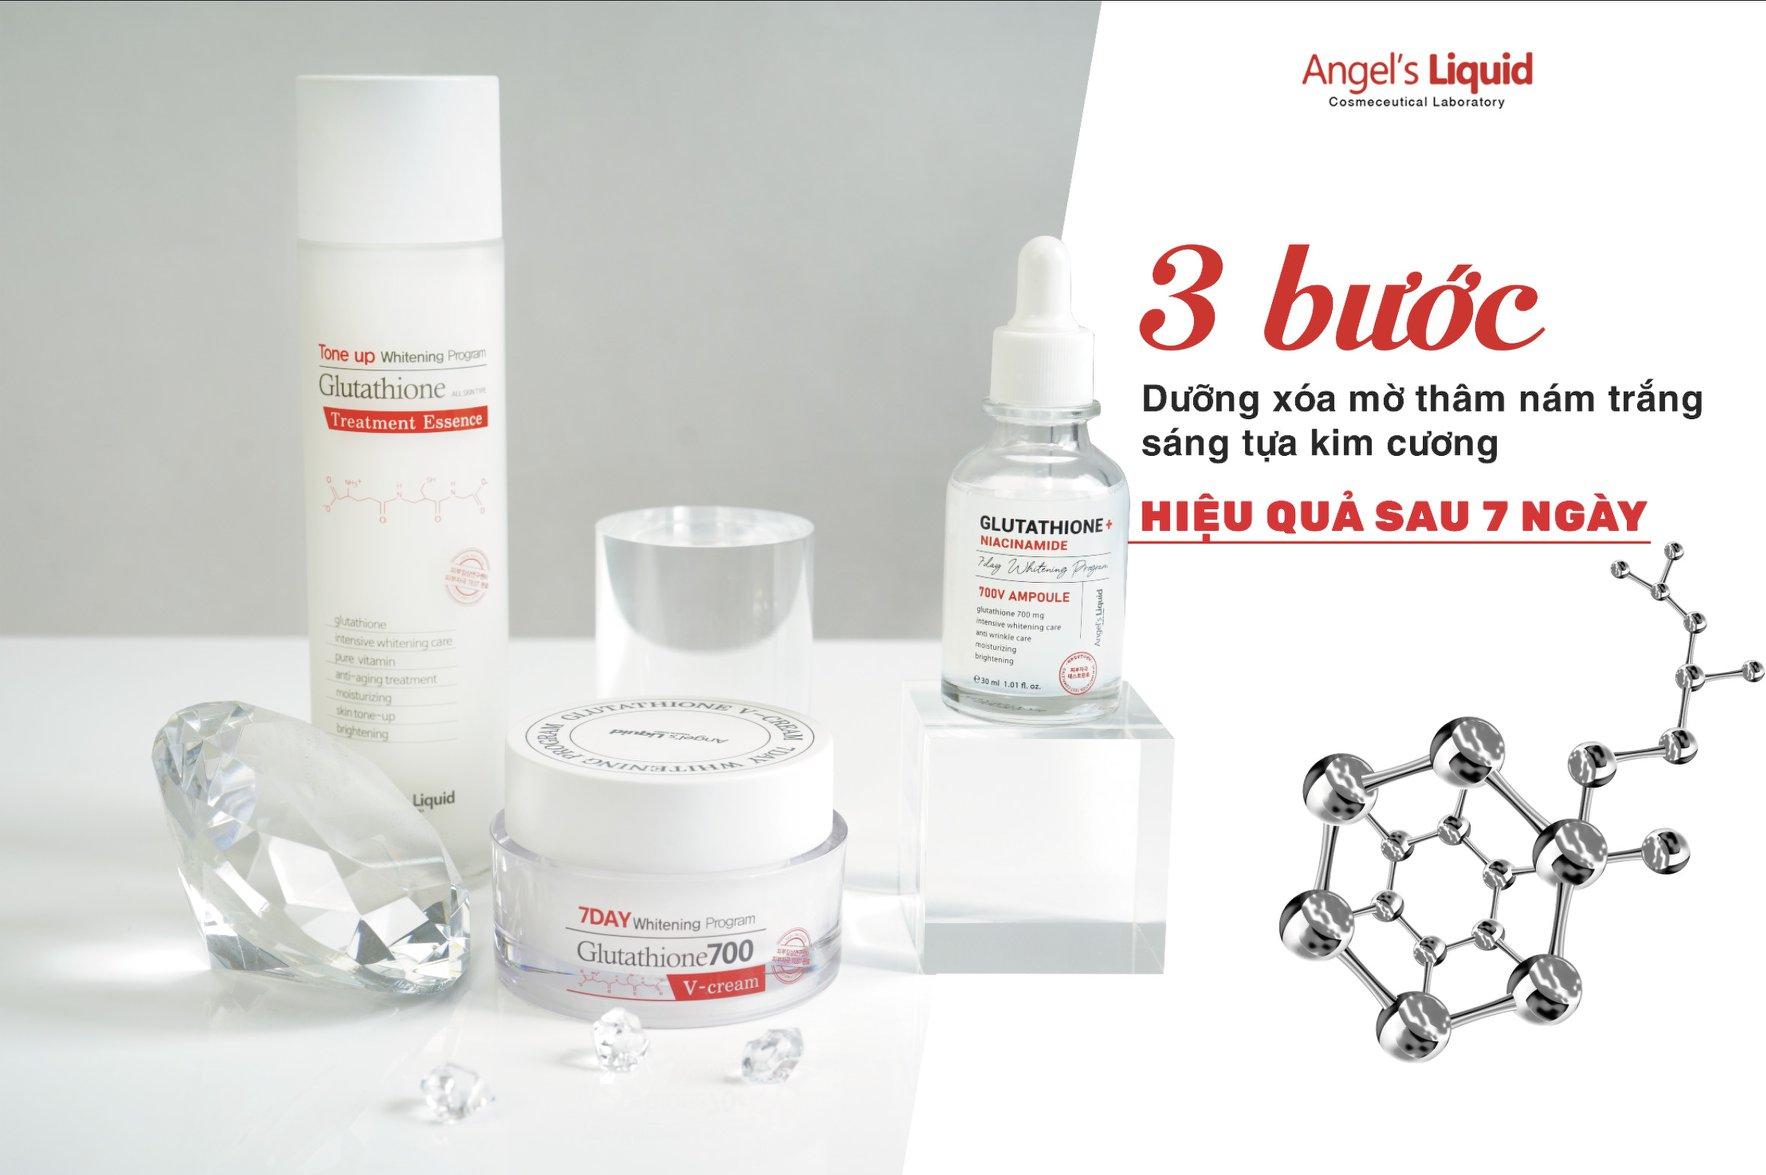 Bộ Sản Phẩm Angel's Liquid Glutathione + Niacinamide ưỡng sáng da, mờ thâm nám